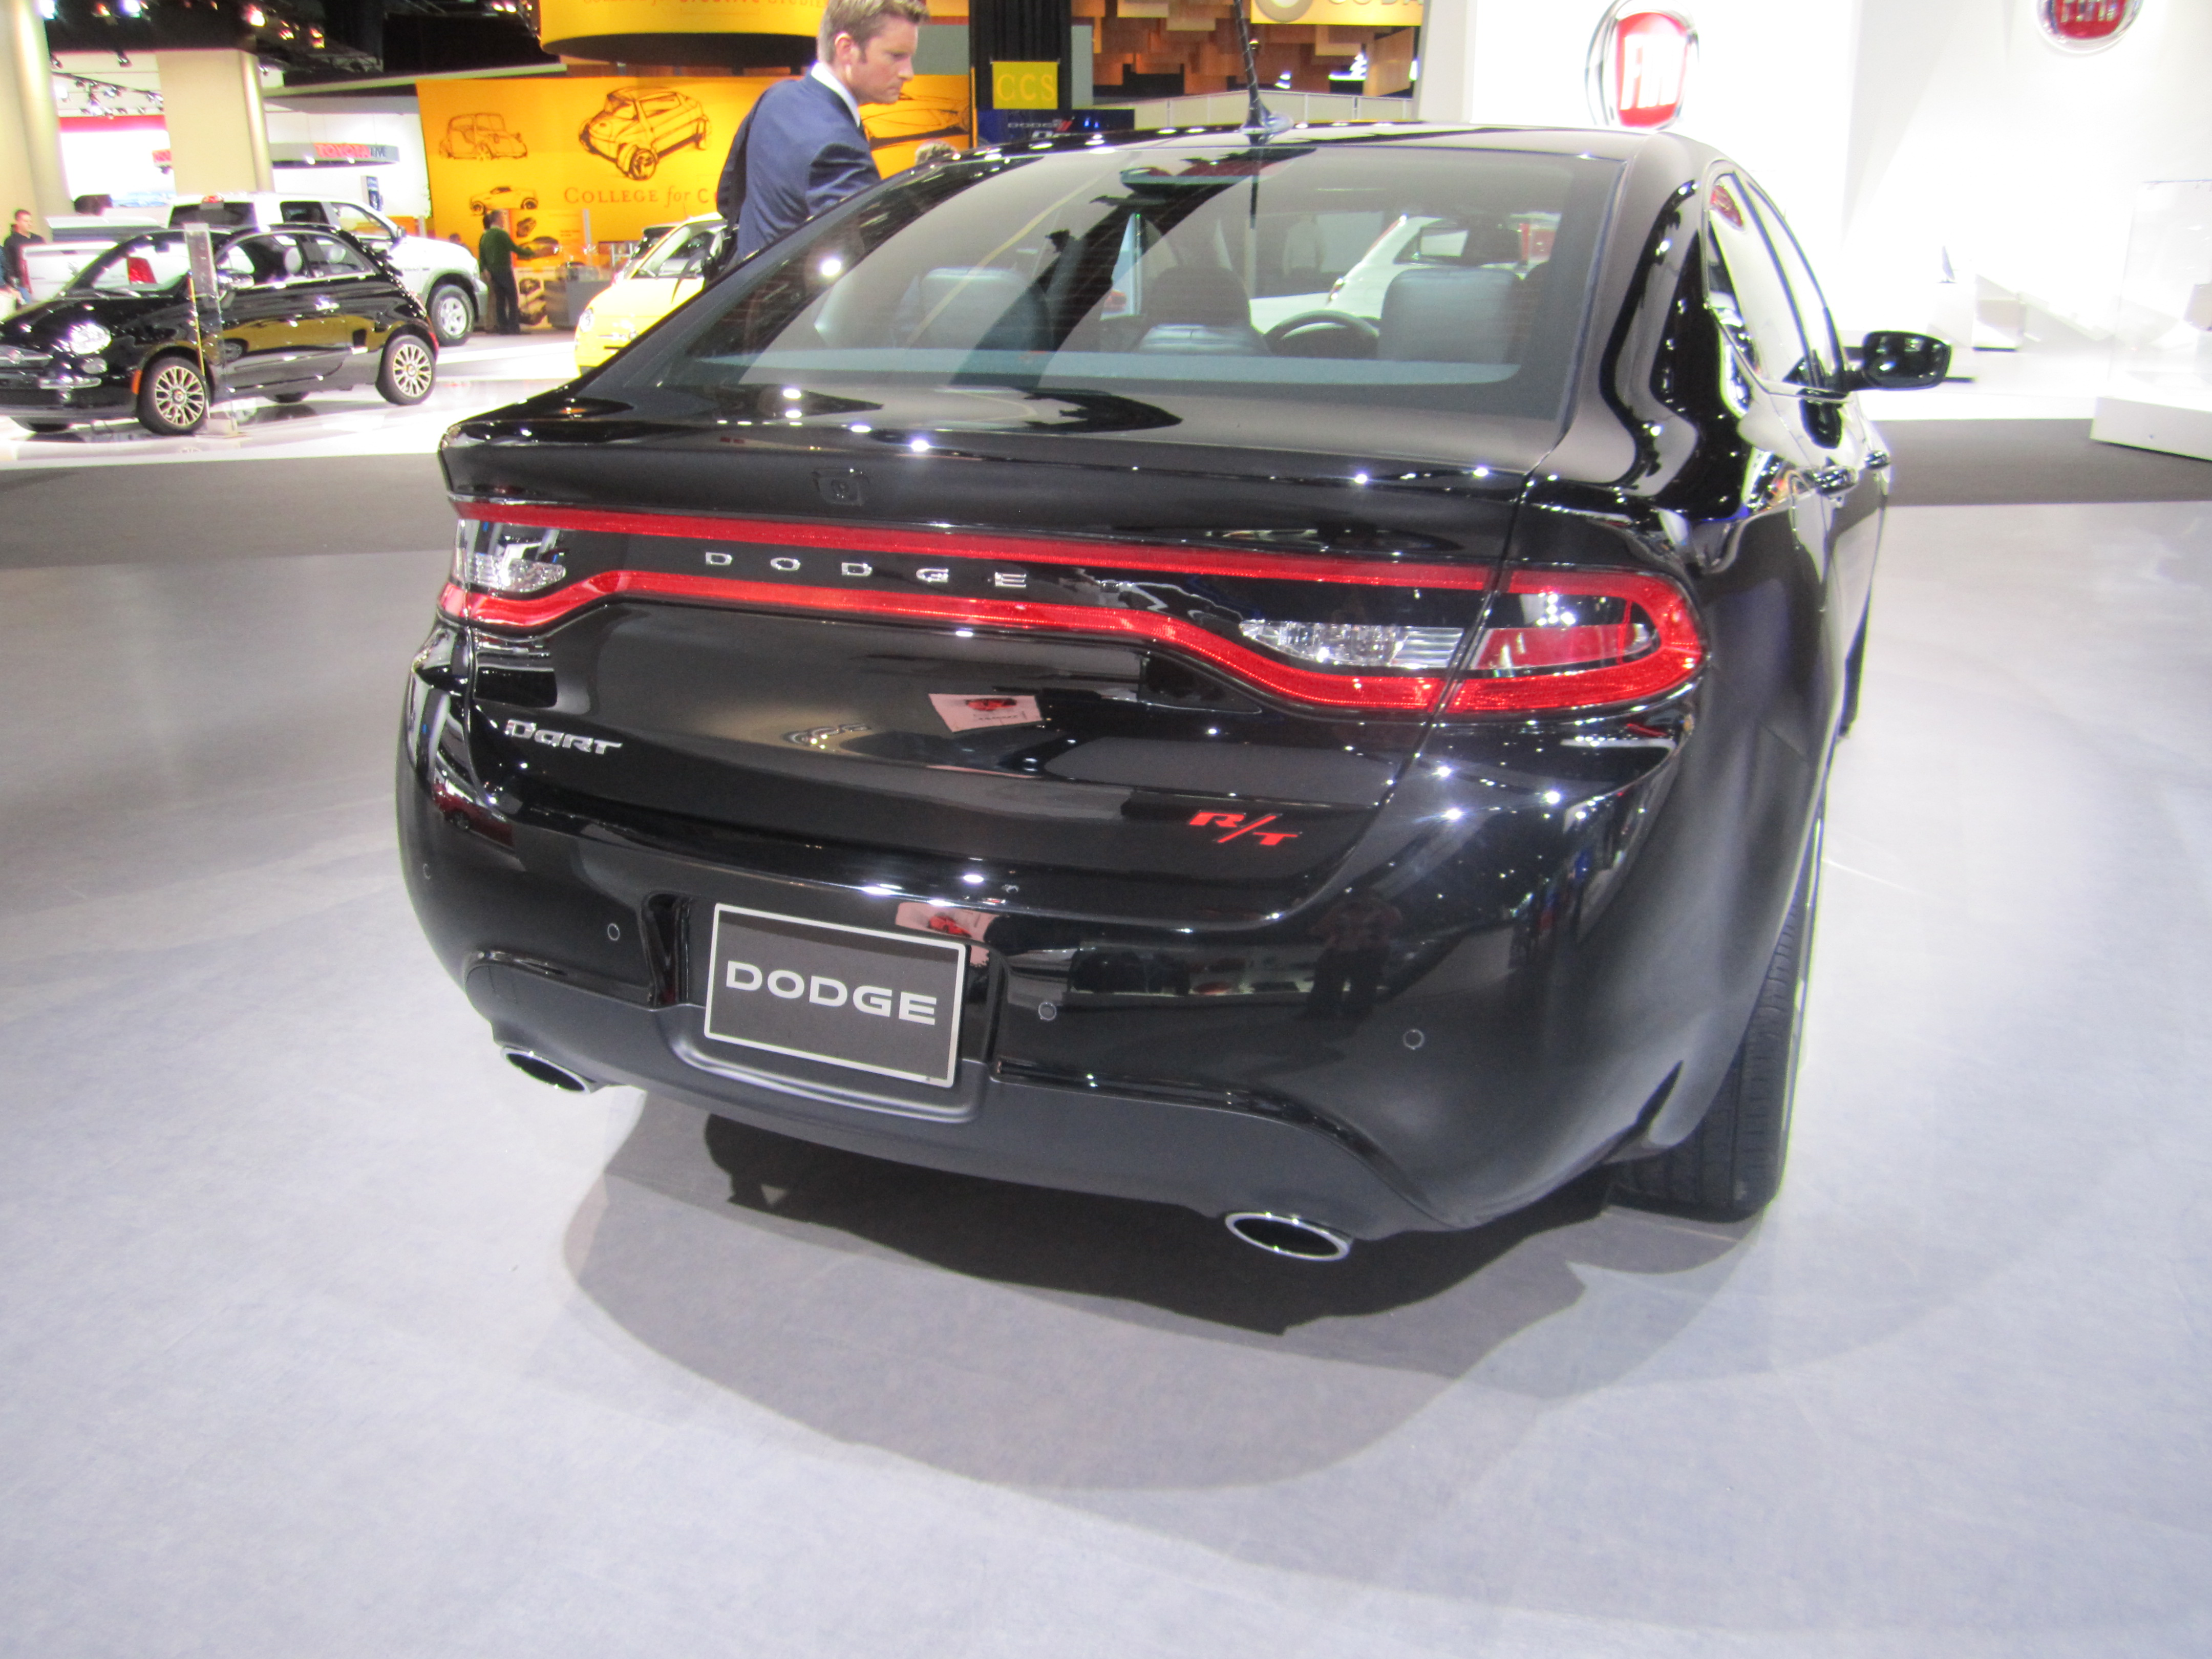 File:2013 Dodge Dart RT (CUSW based on Alfa Romeo Giulietta).jpg ...